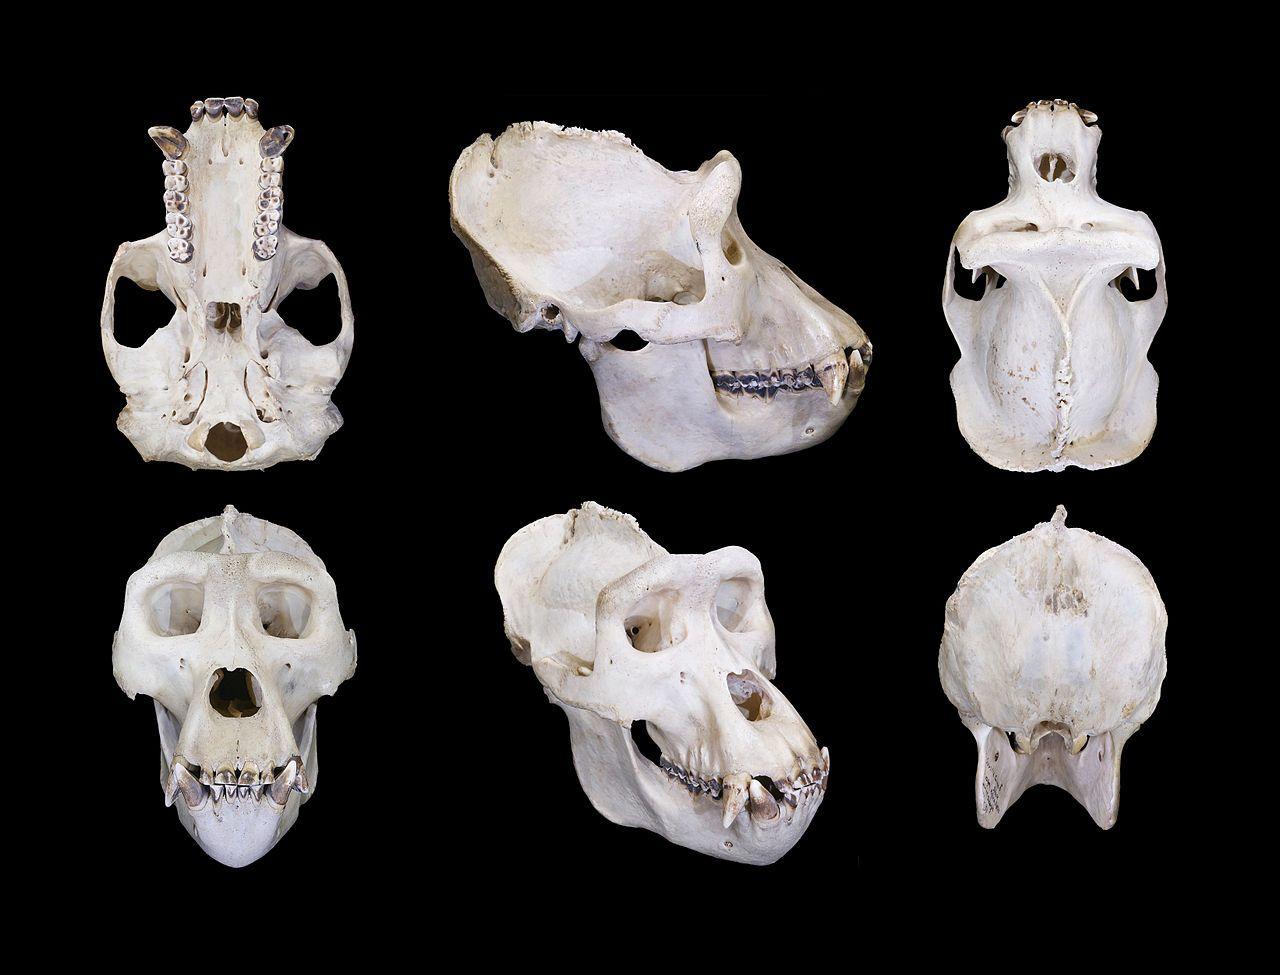 Gorilla Male Global - Western lowland gorilla - Wikipedia, the free ...